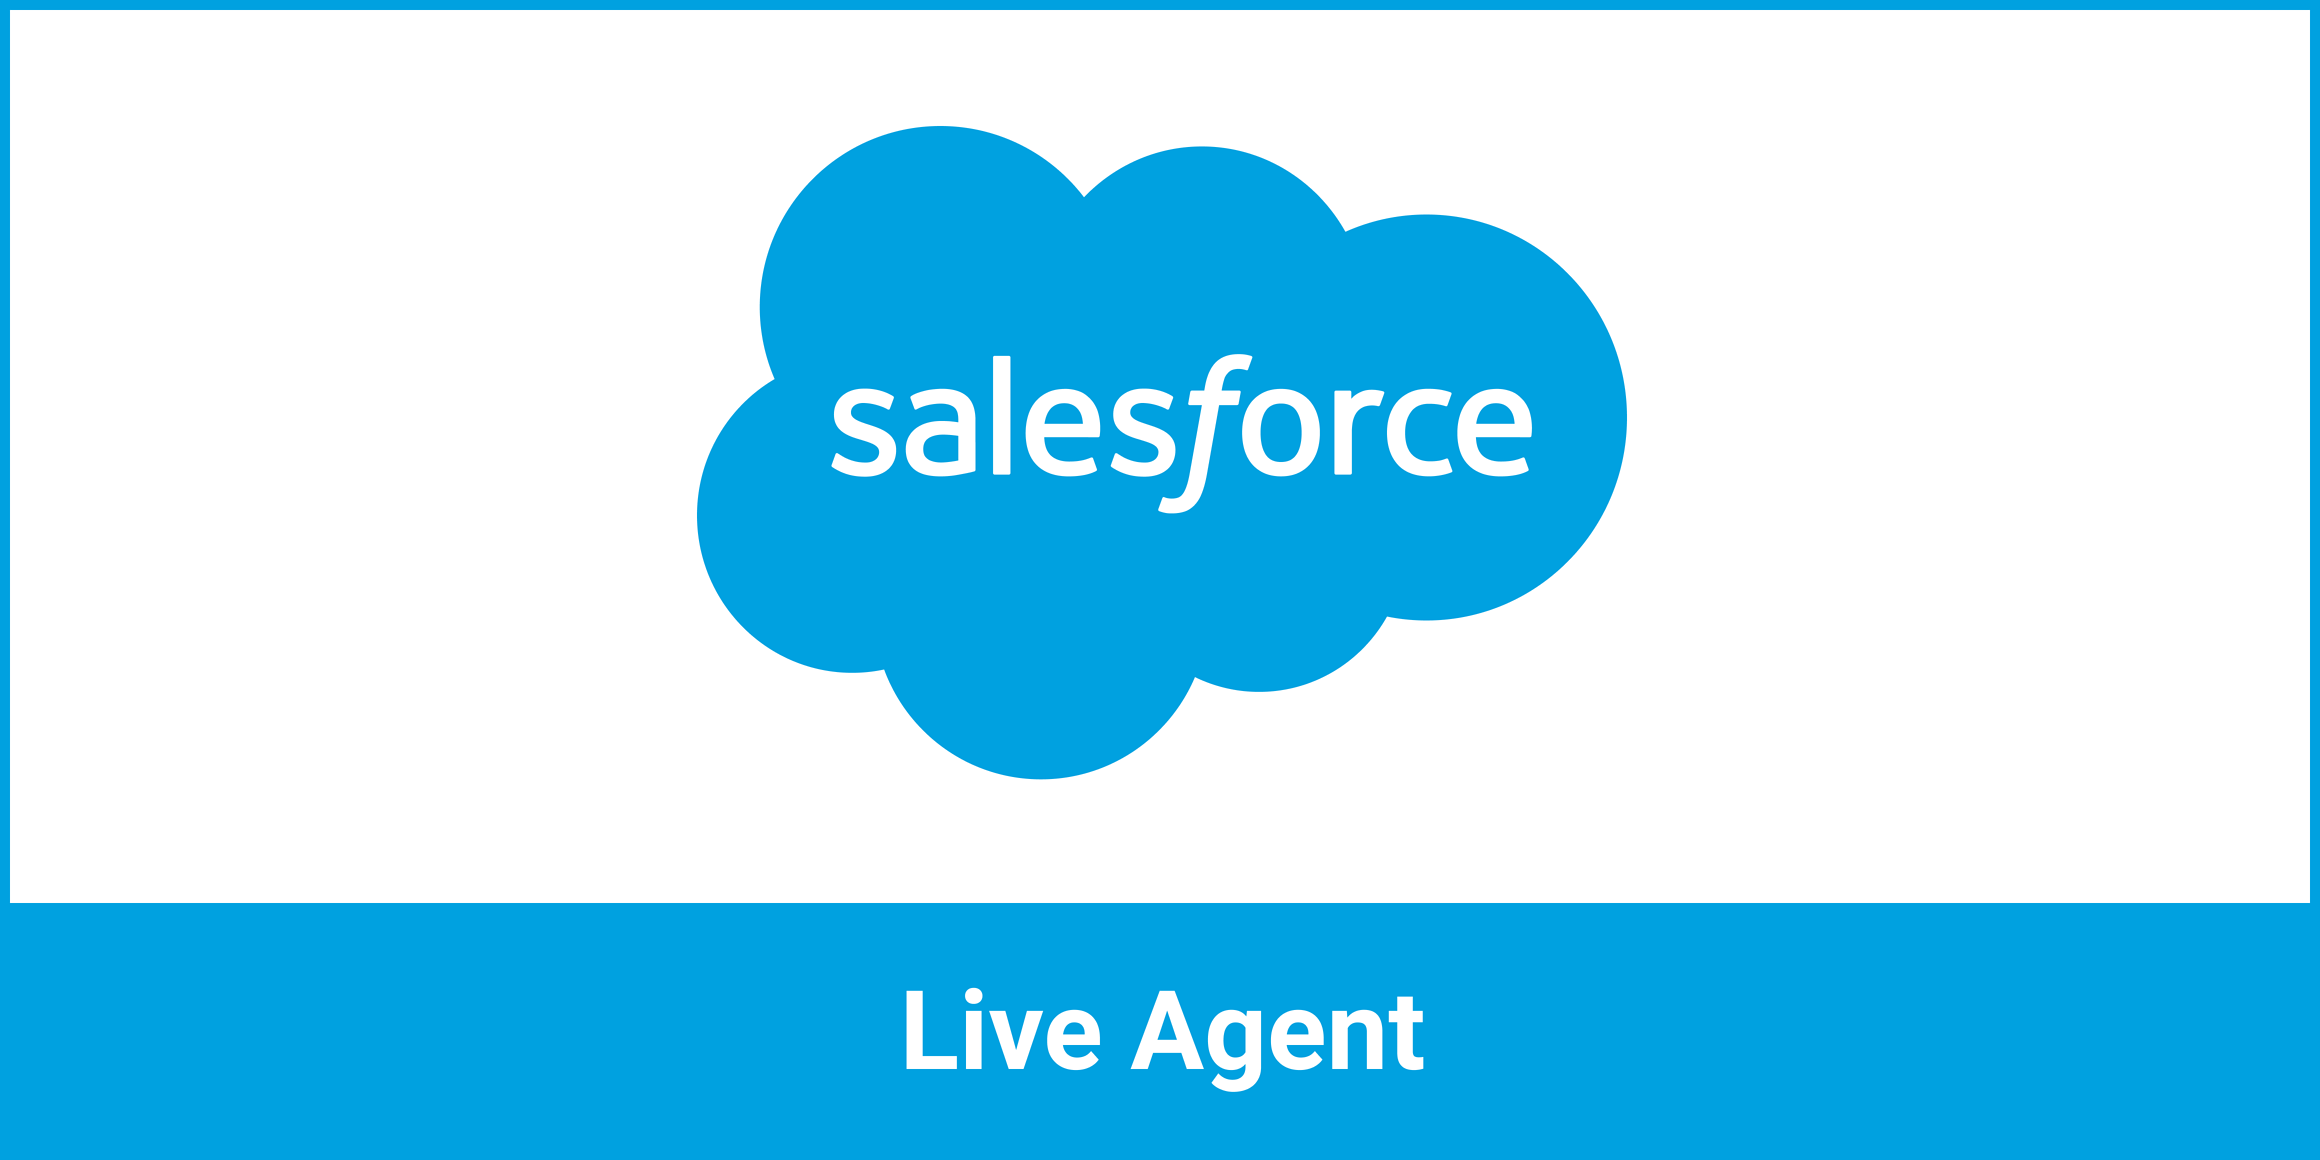 salesforce-live-agent